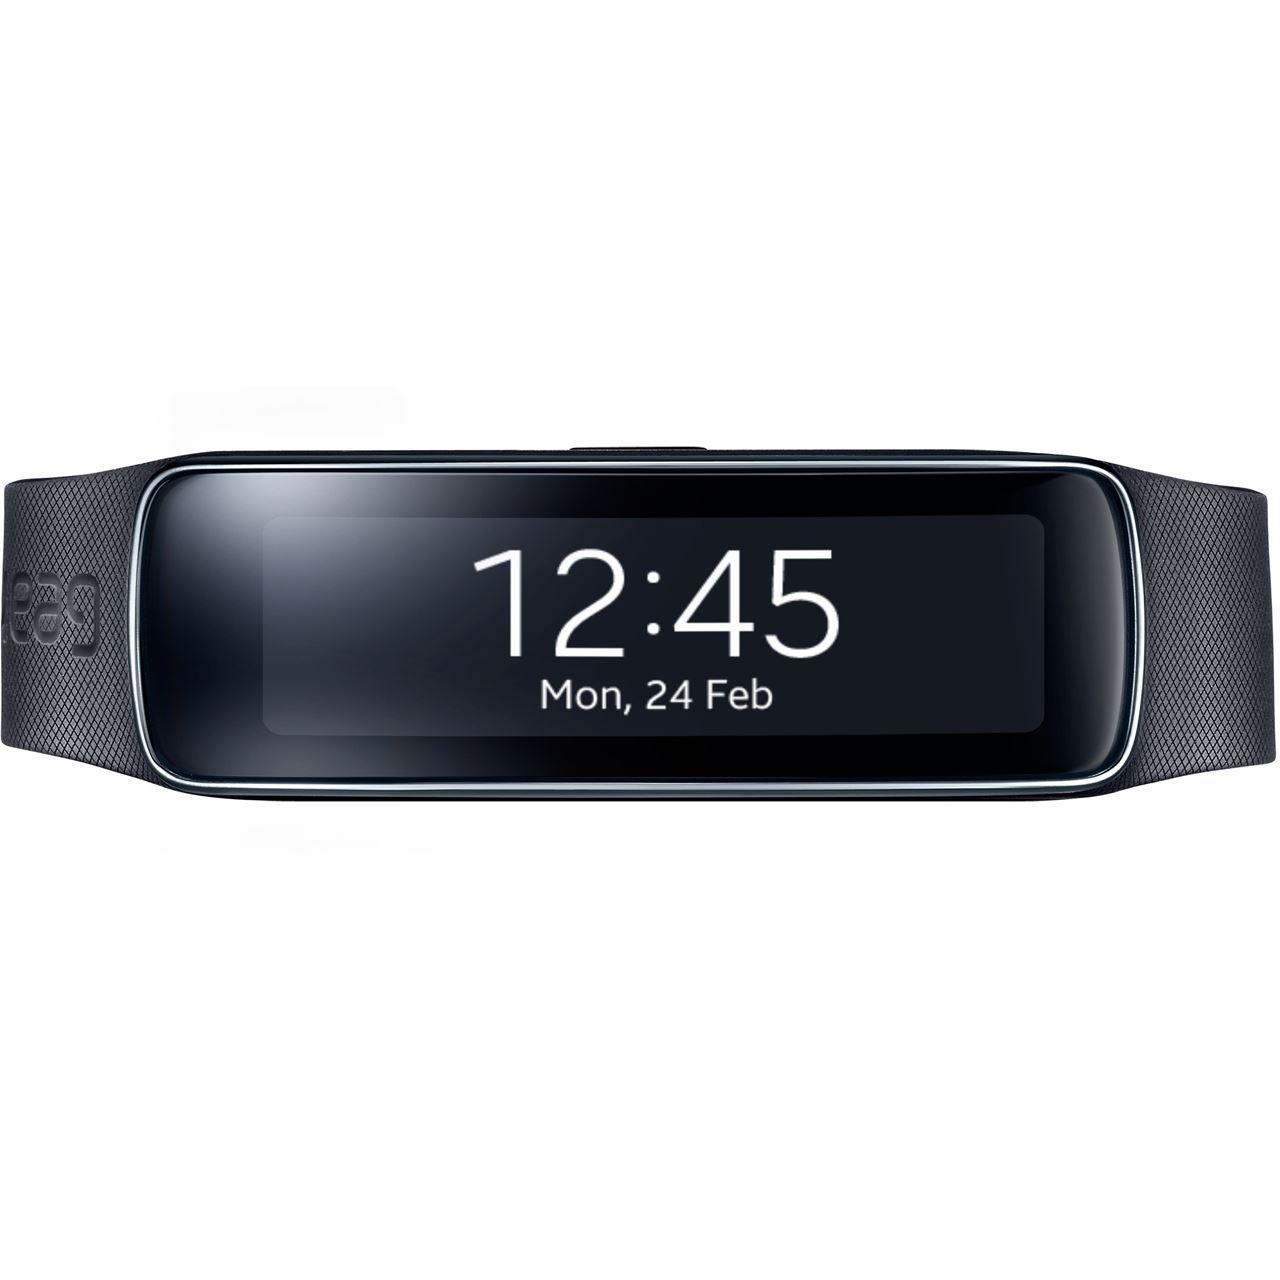 Samsung Galaxy Gear Fit SM-R350 Smartwatch Tracker - Retail Packaging - Charcoal Black